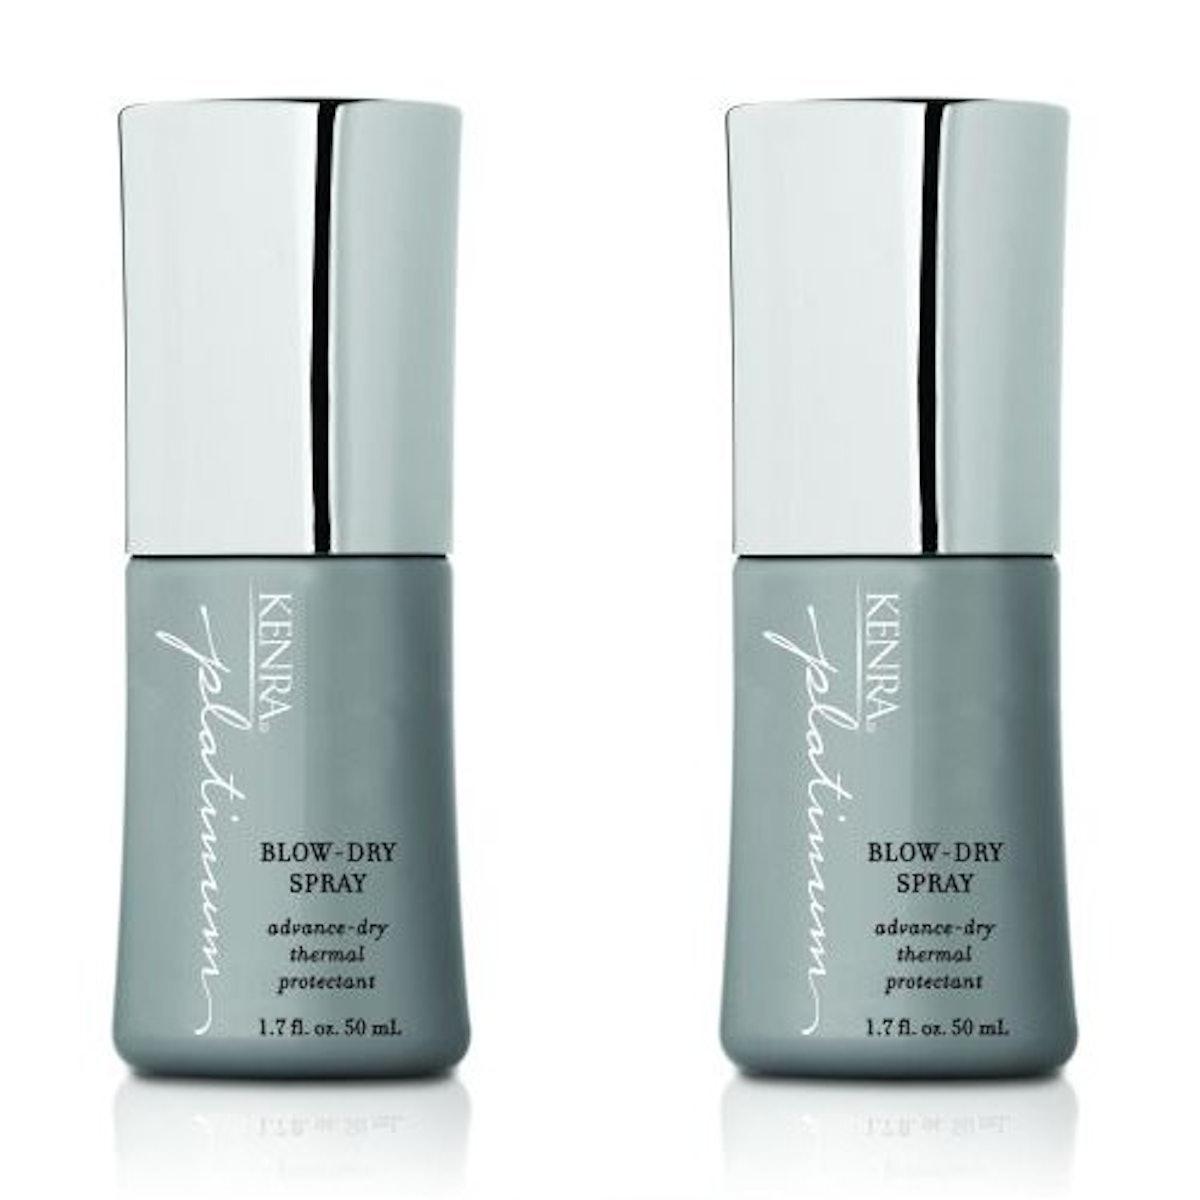 Kenra Platinum Blow Dry Spray (2 Pack)